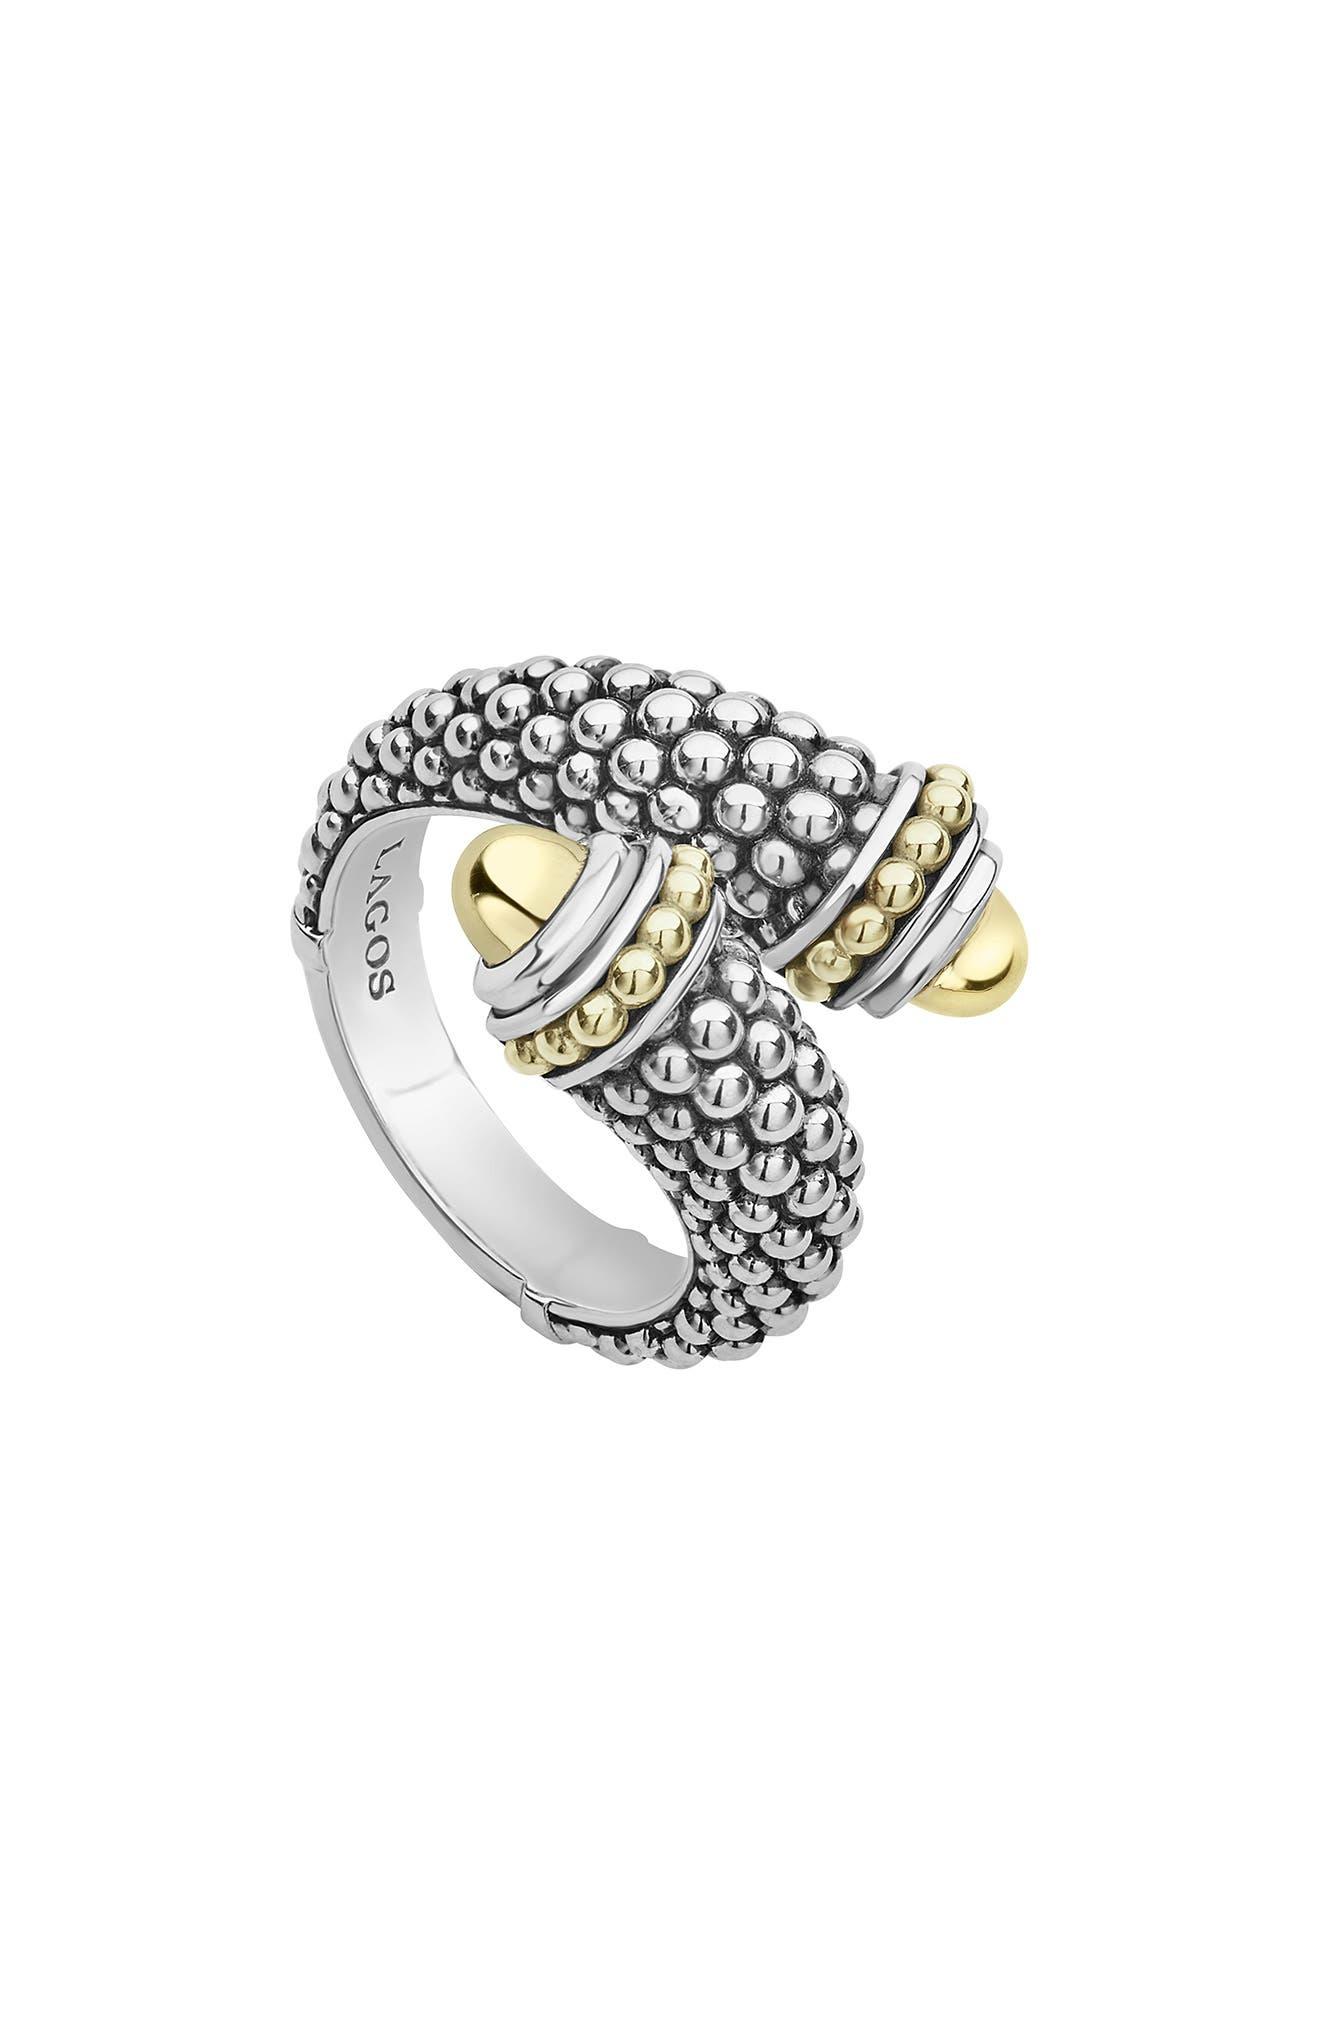 Signature Caviar Gold Cap Crossover Ring,                             Main thumbnail 1, color,                             SILVER/ GOLD